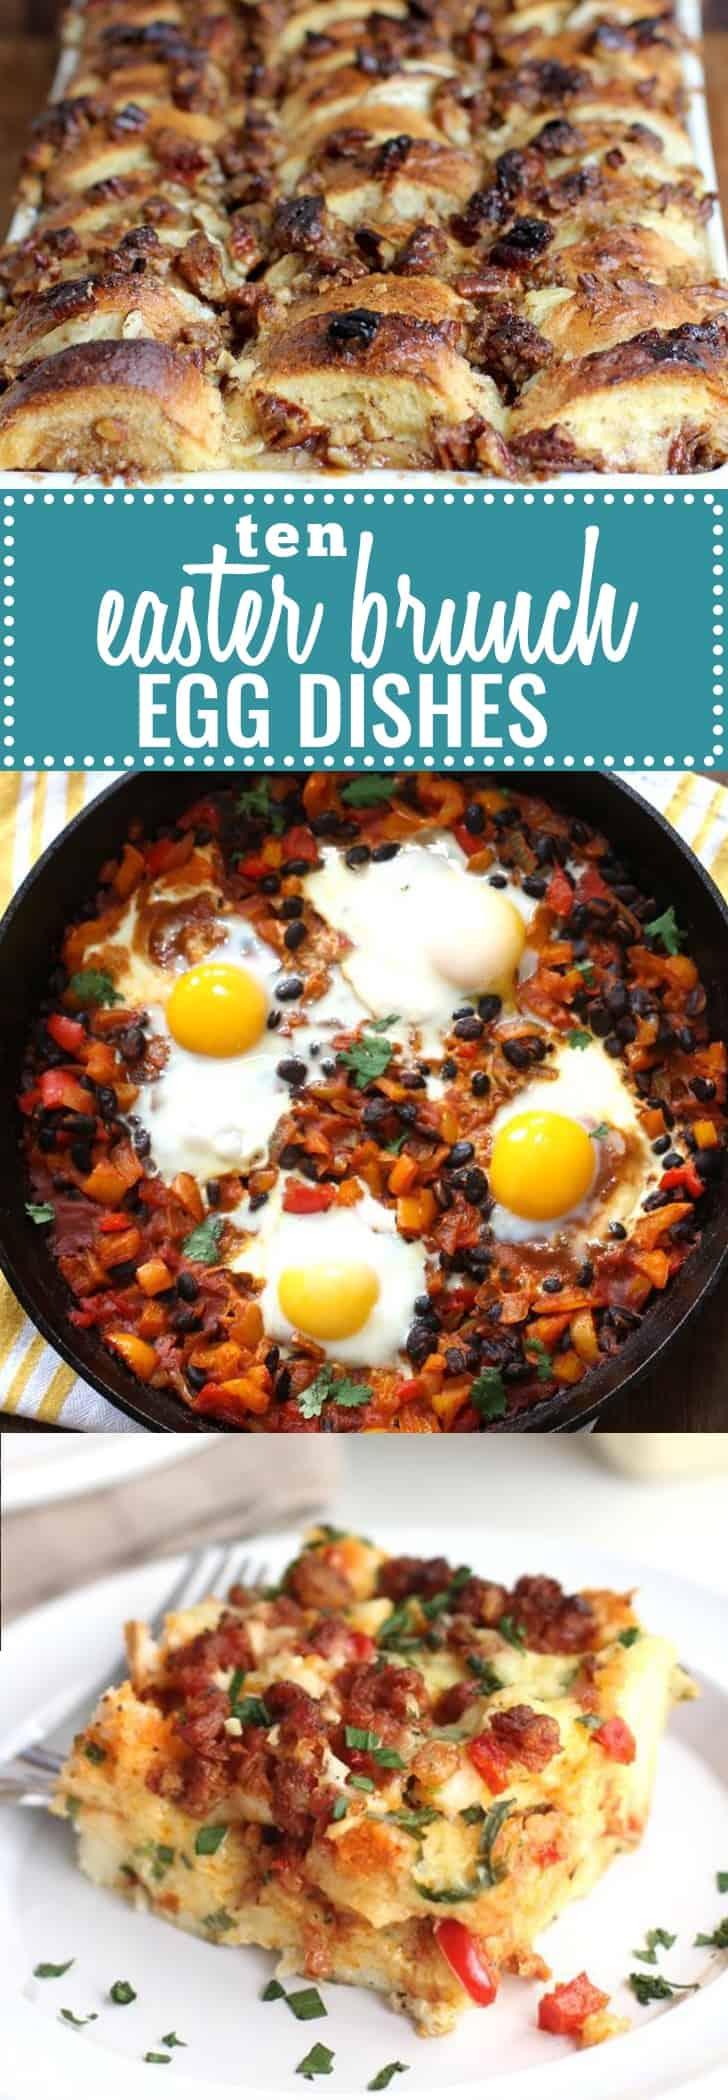 Ten Egg Dishes for Easter Brunch